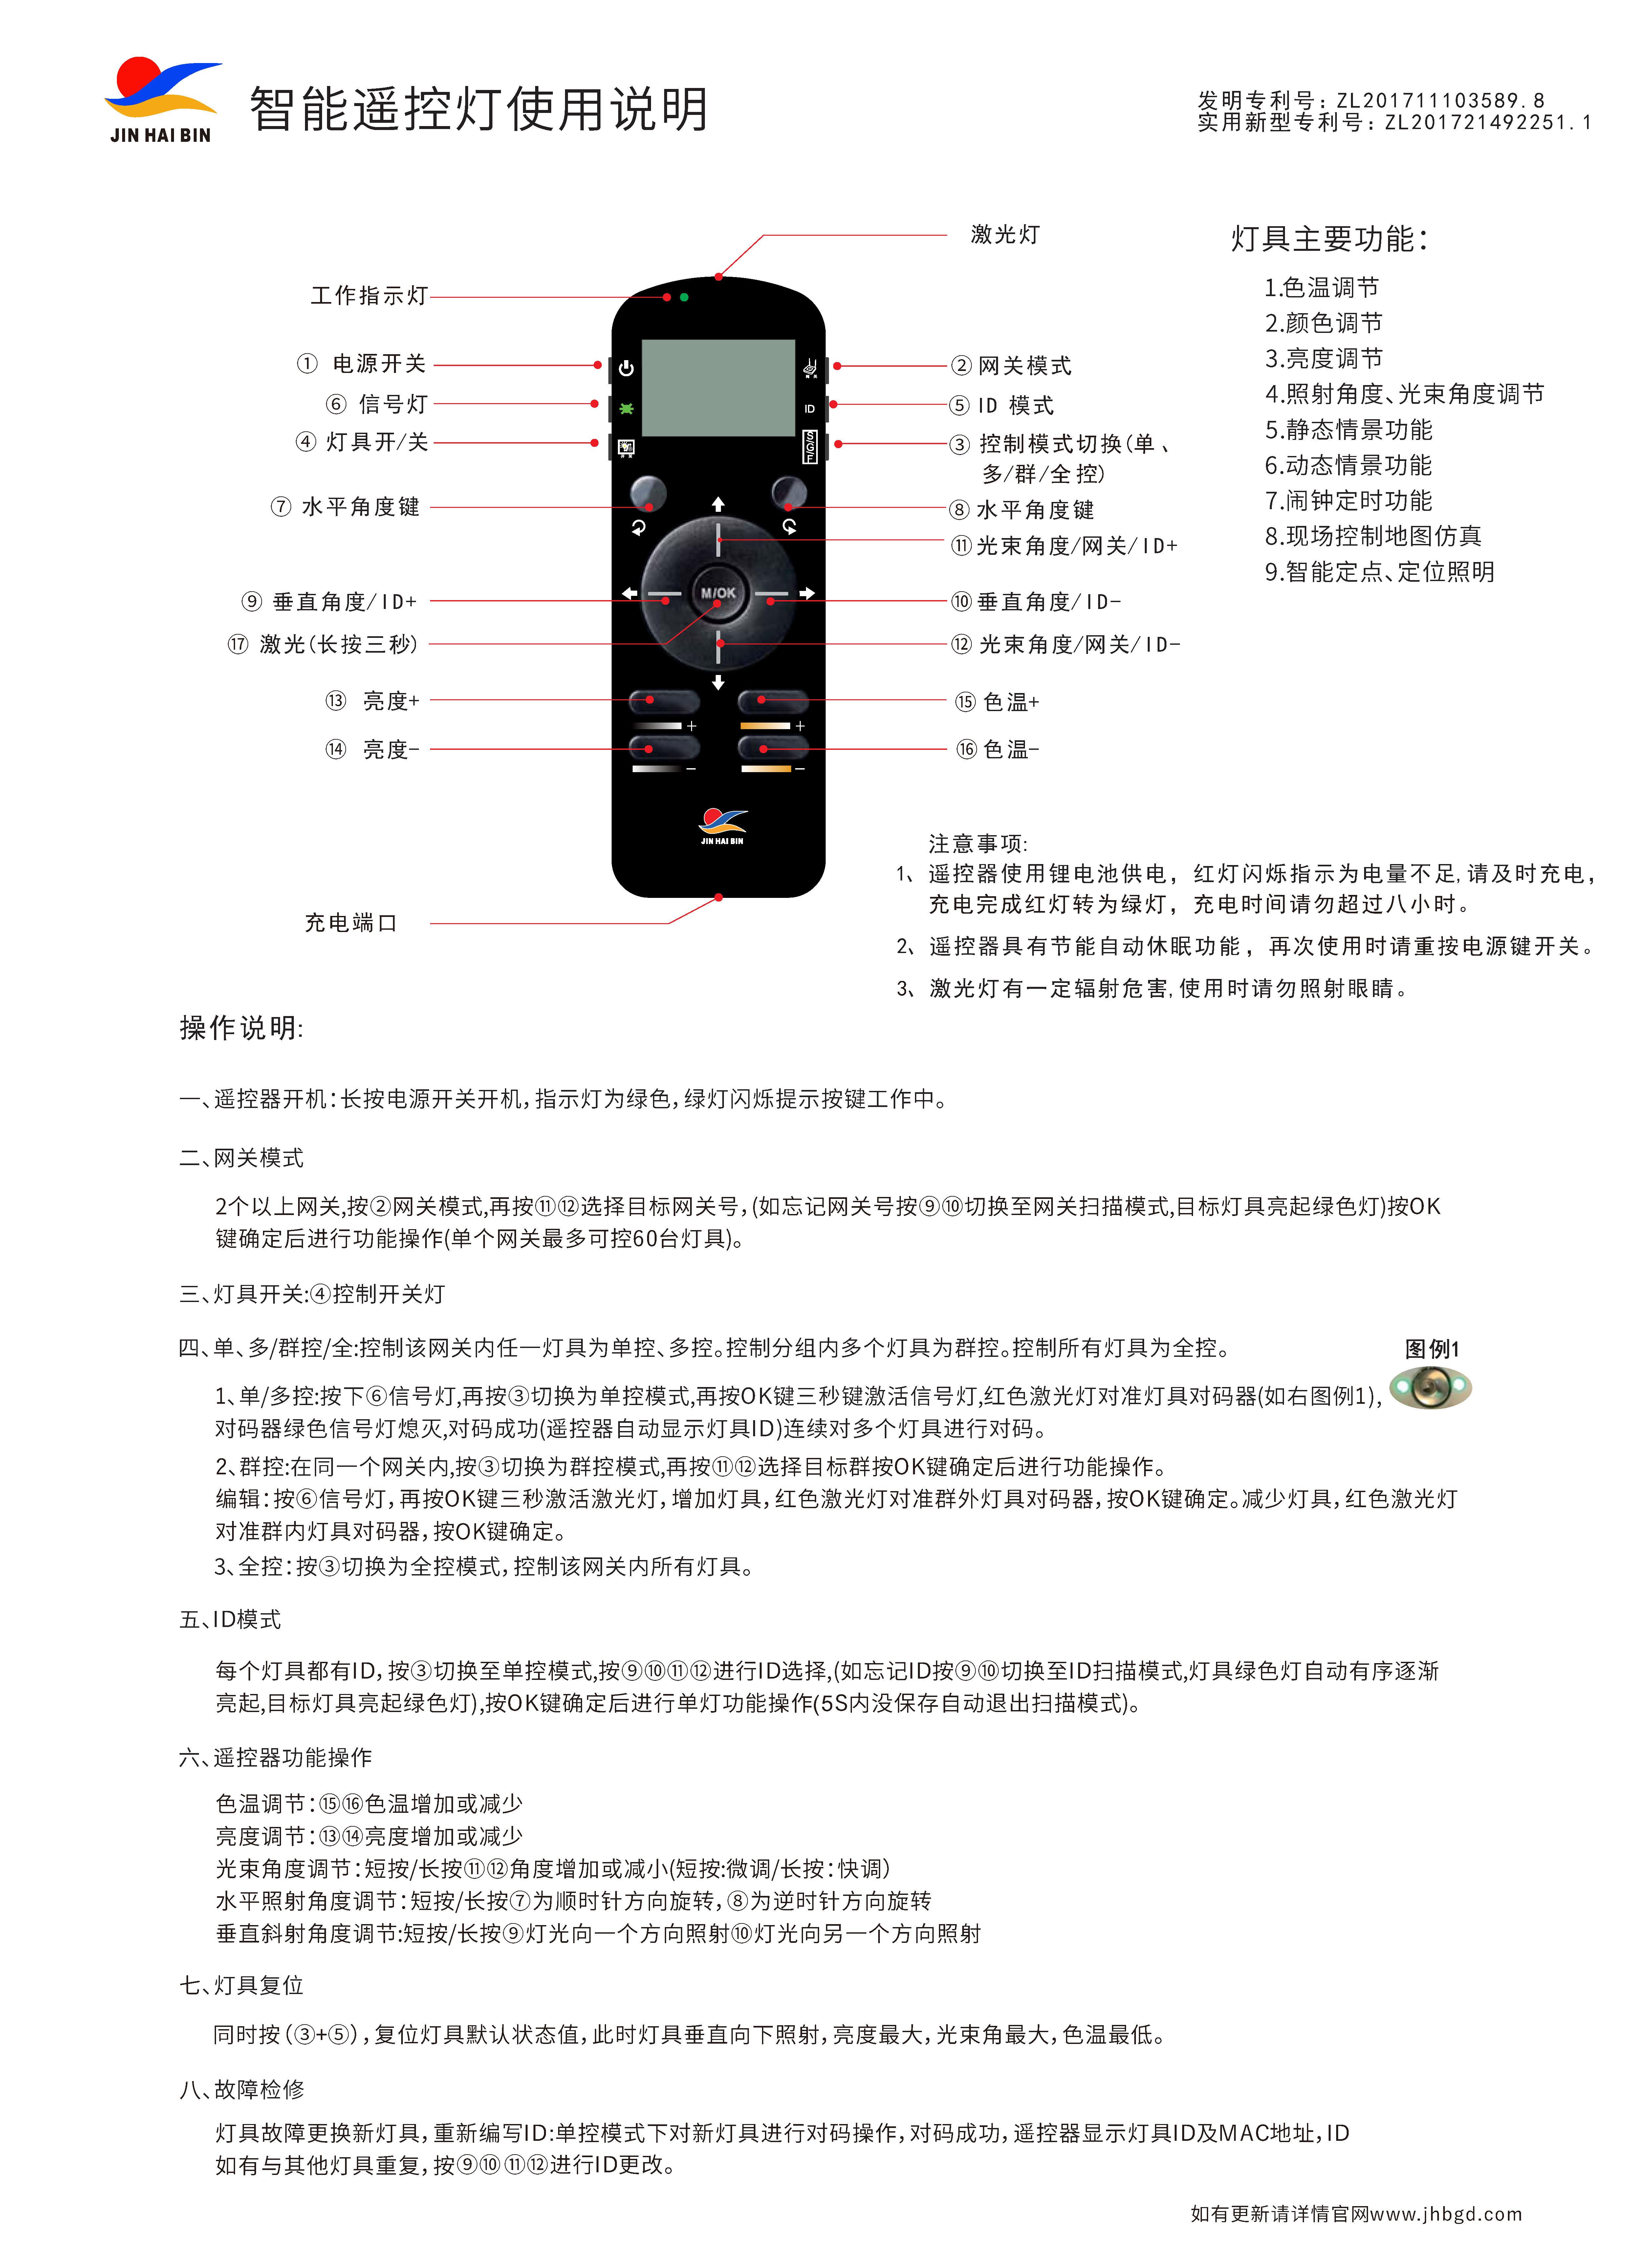 遥控器说明-2019-3-11